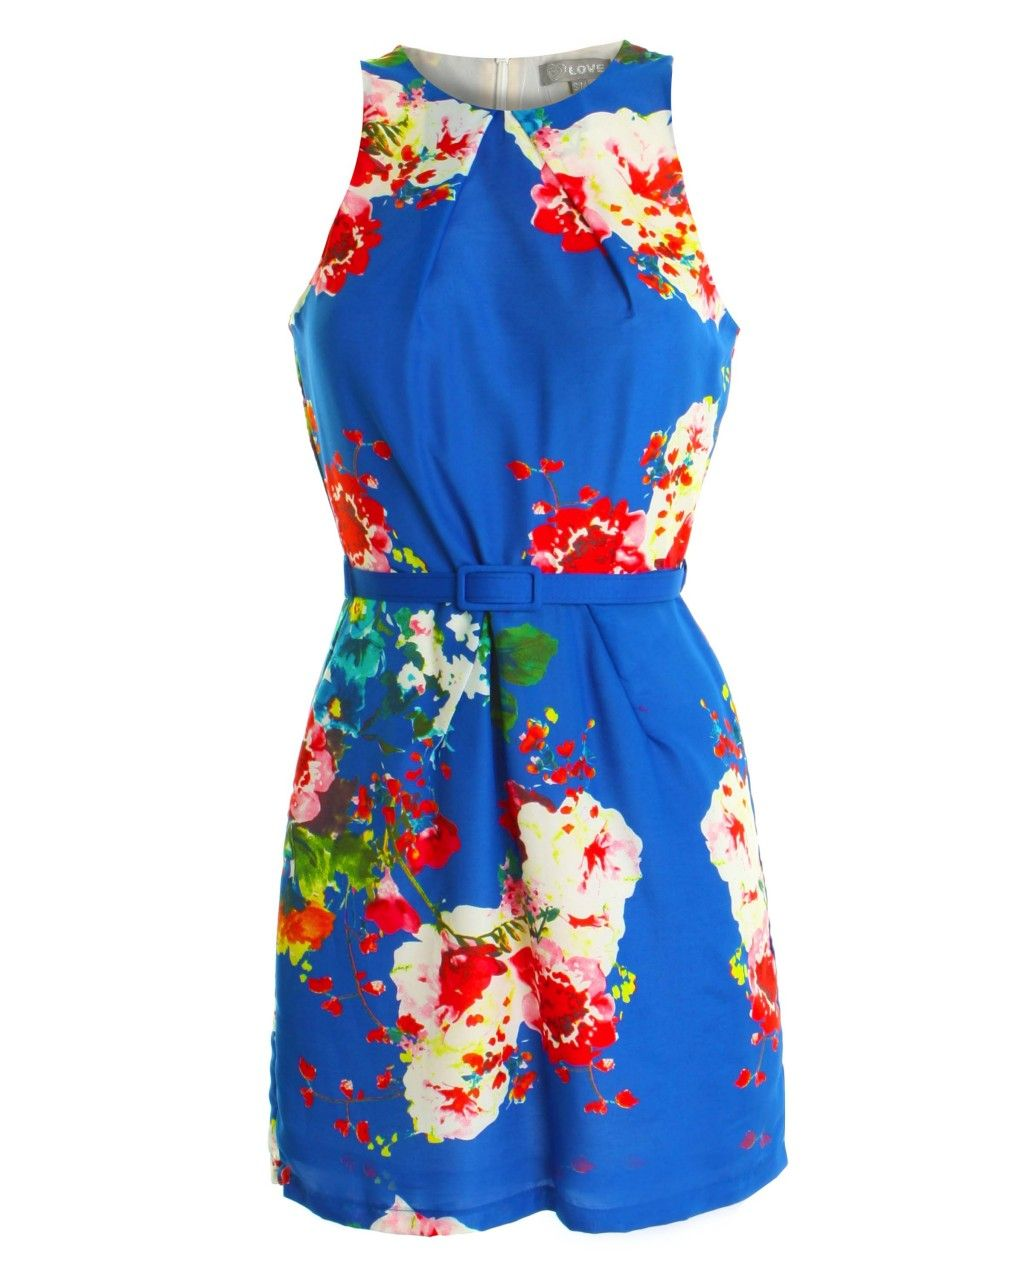 Blue placement print dress